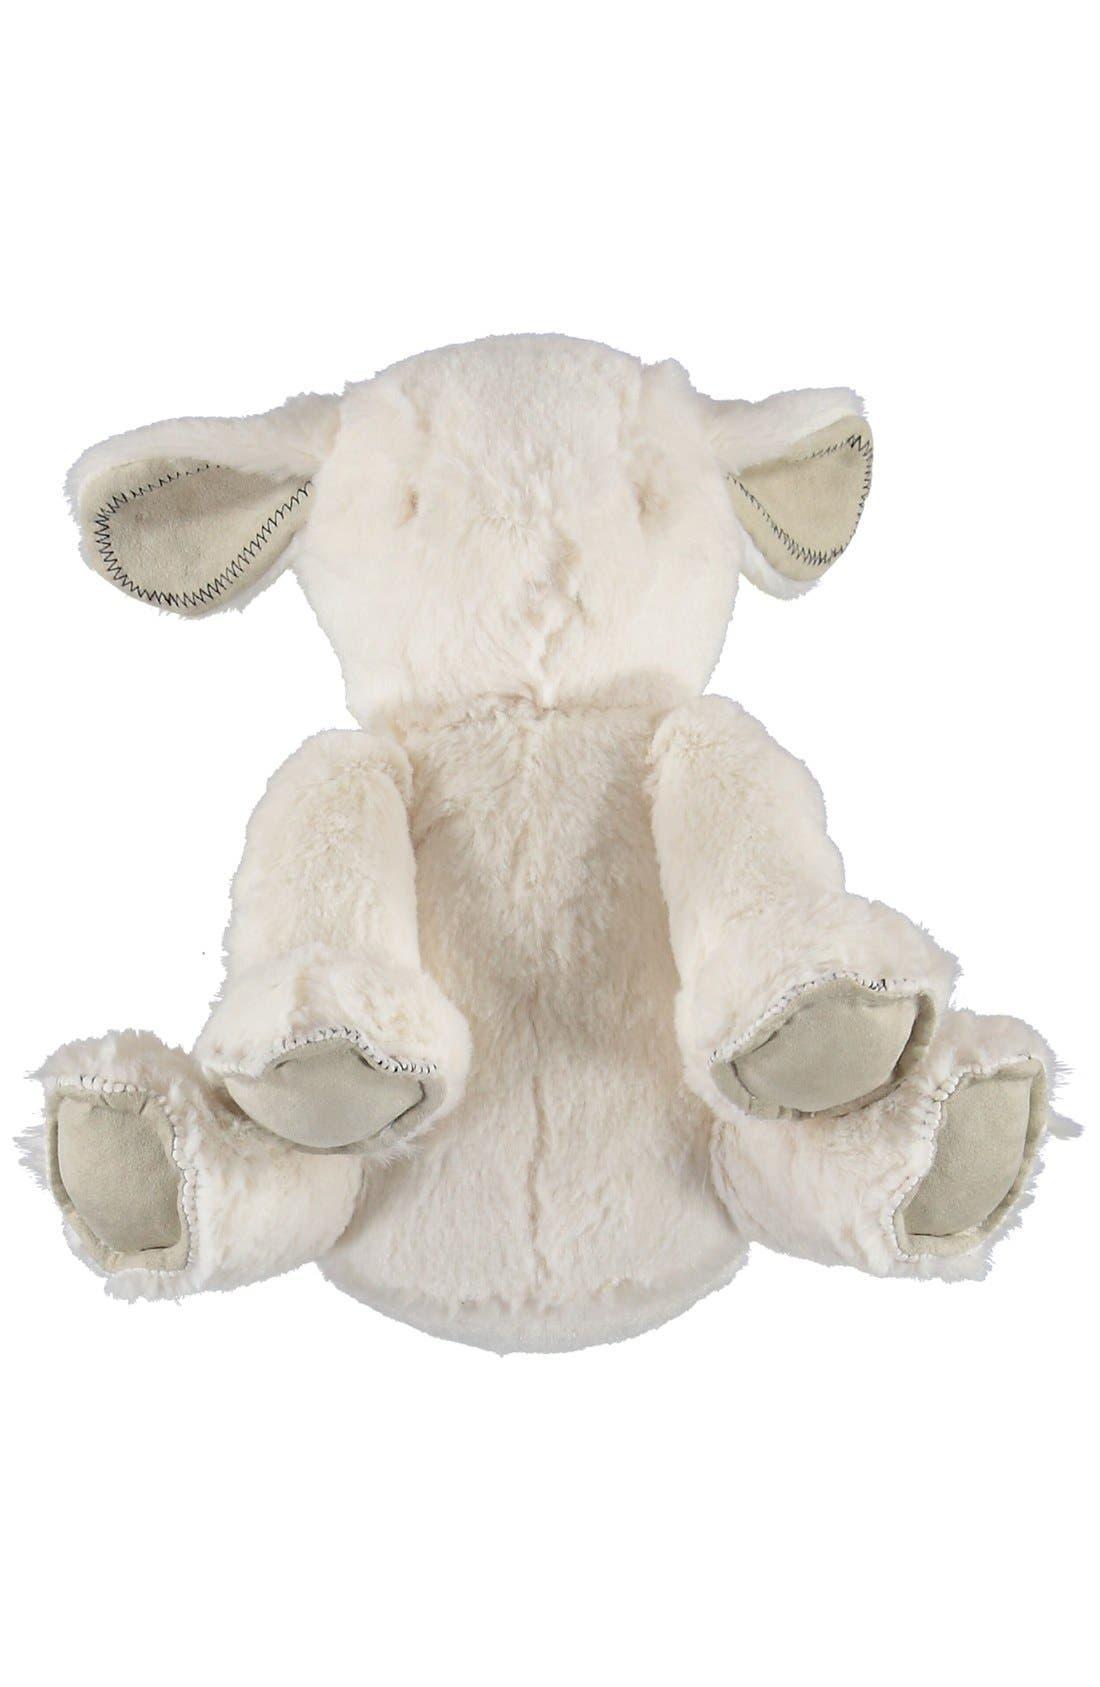 Barefoot Dreams® 'Cuddle Buddie' Plush Toy